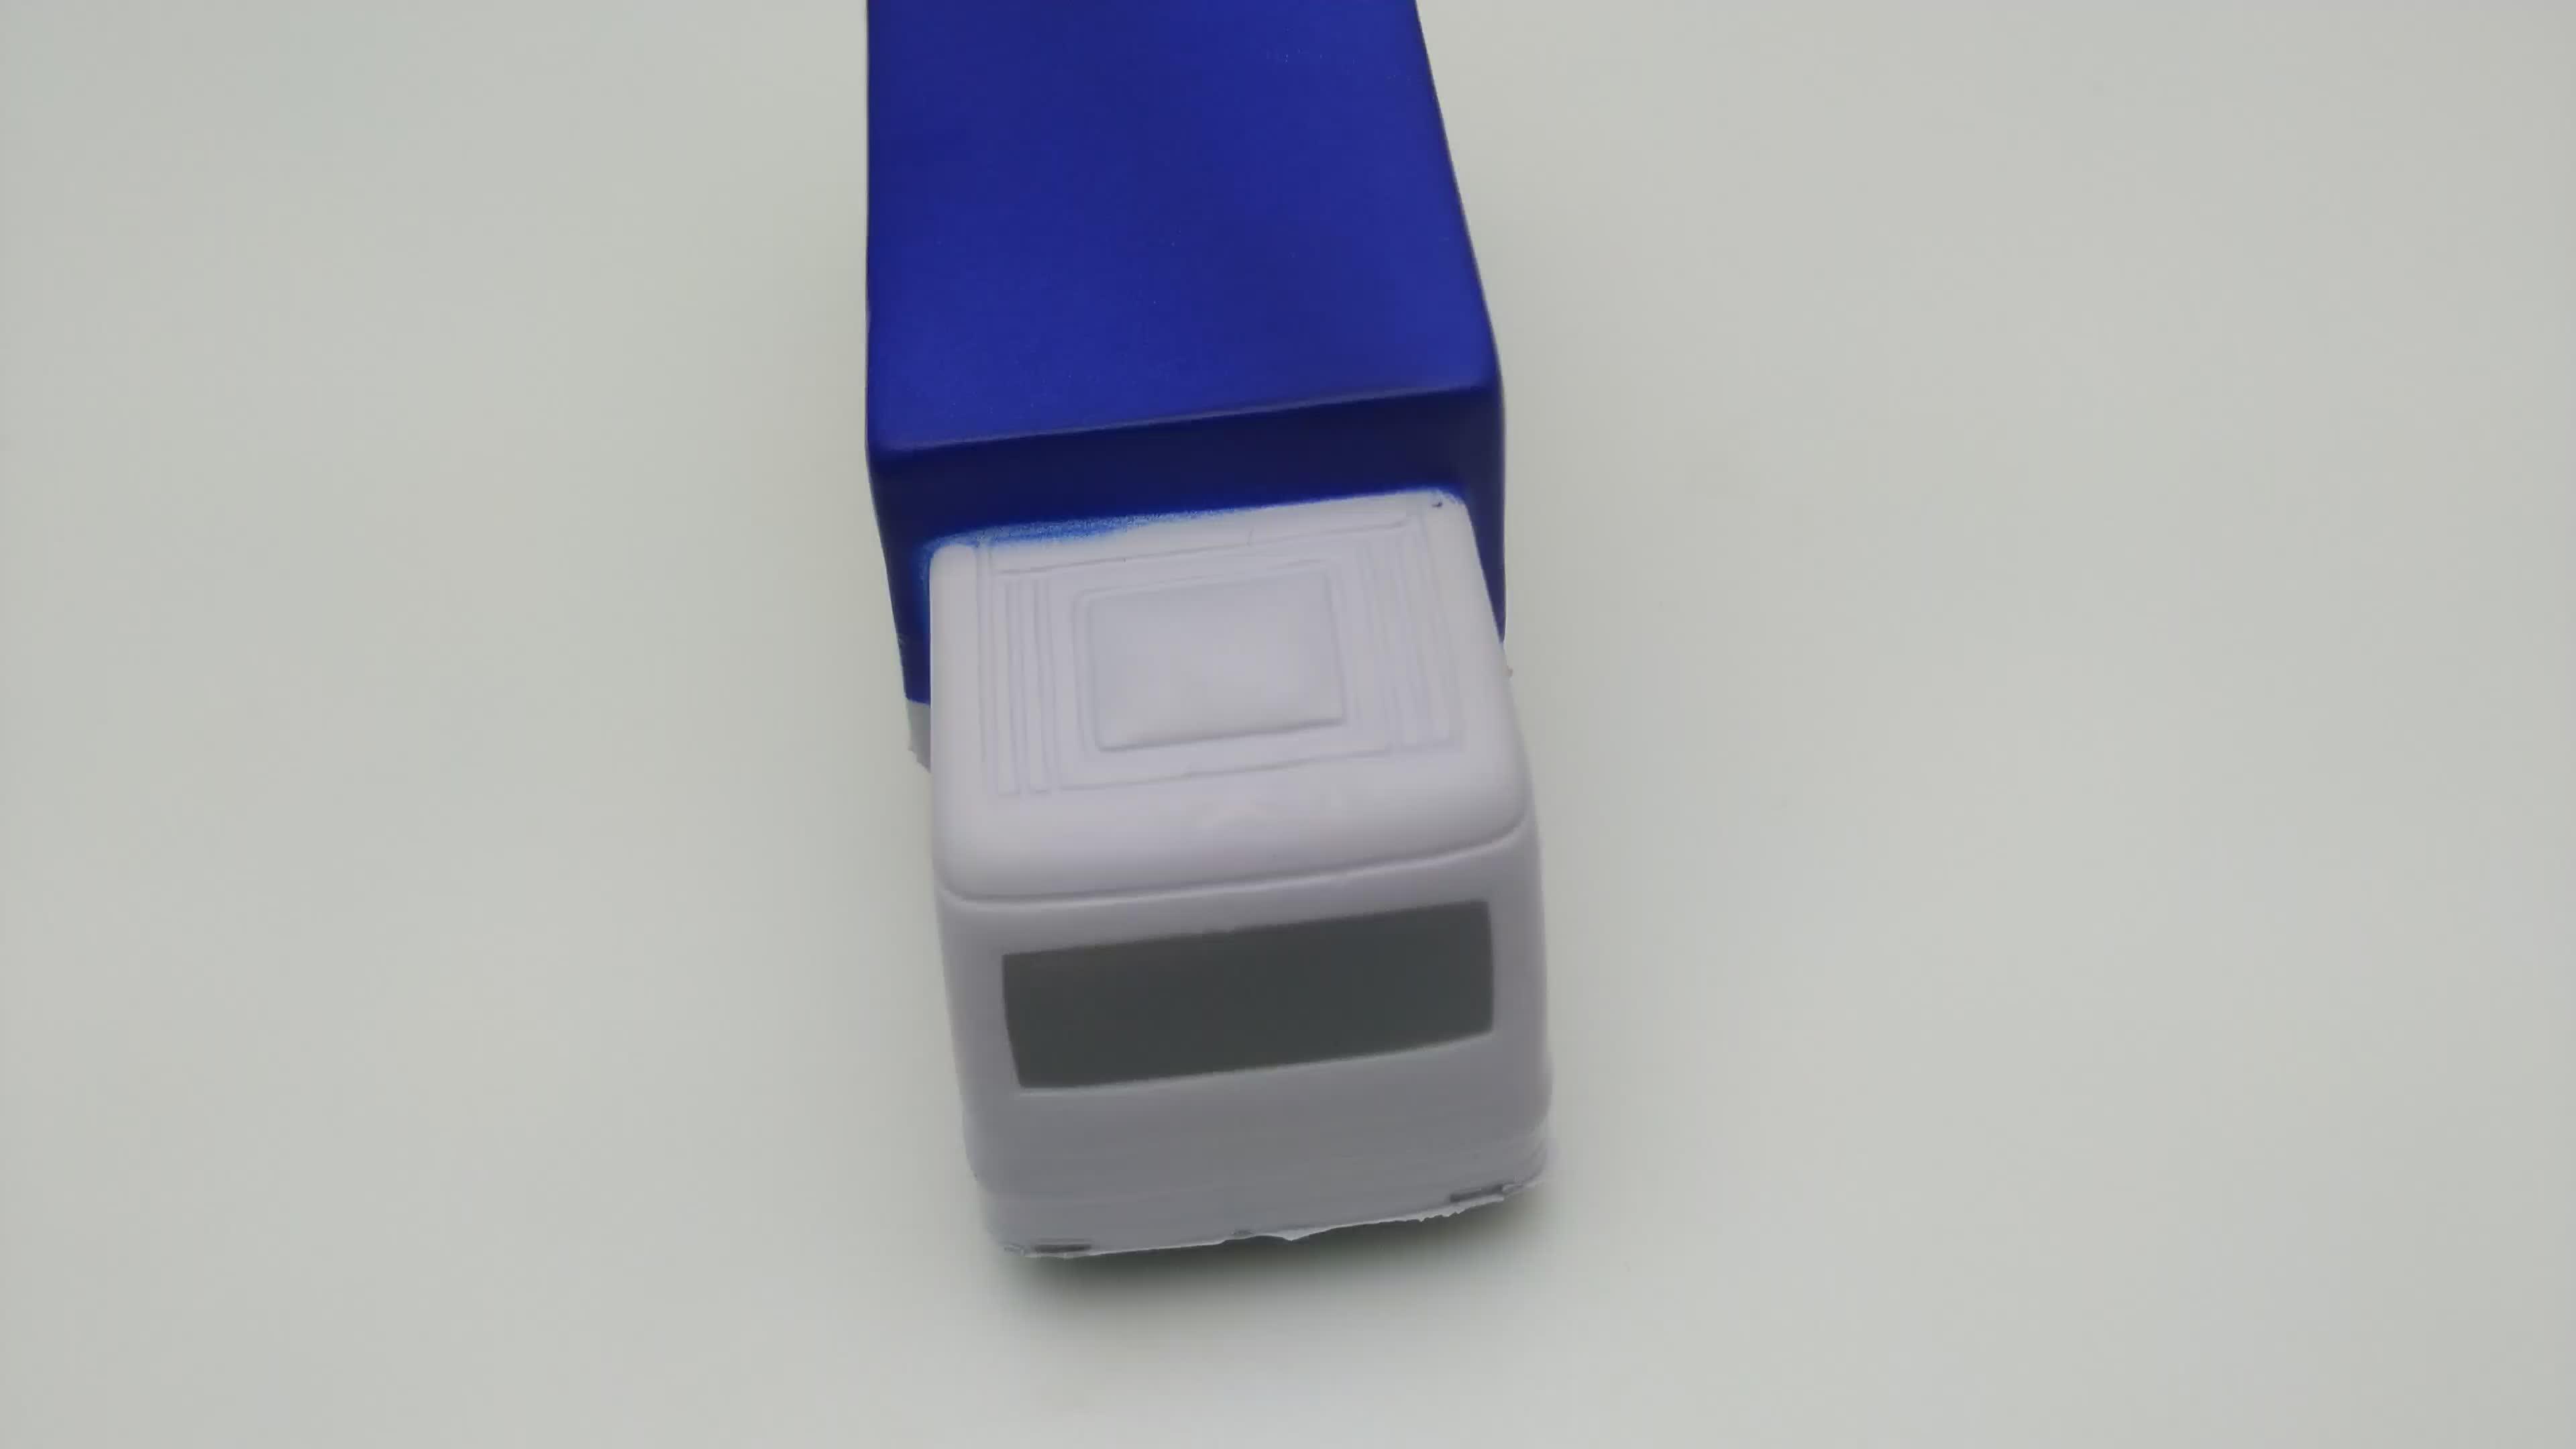 Hot Sell Promotional Pu Foam Truck Shape Stress Ball Anti Stress Toy With Custom Logo